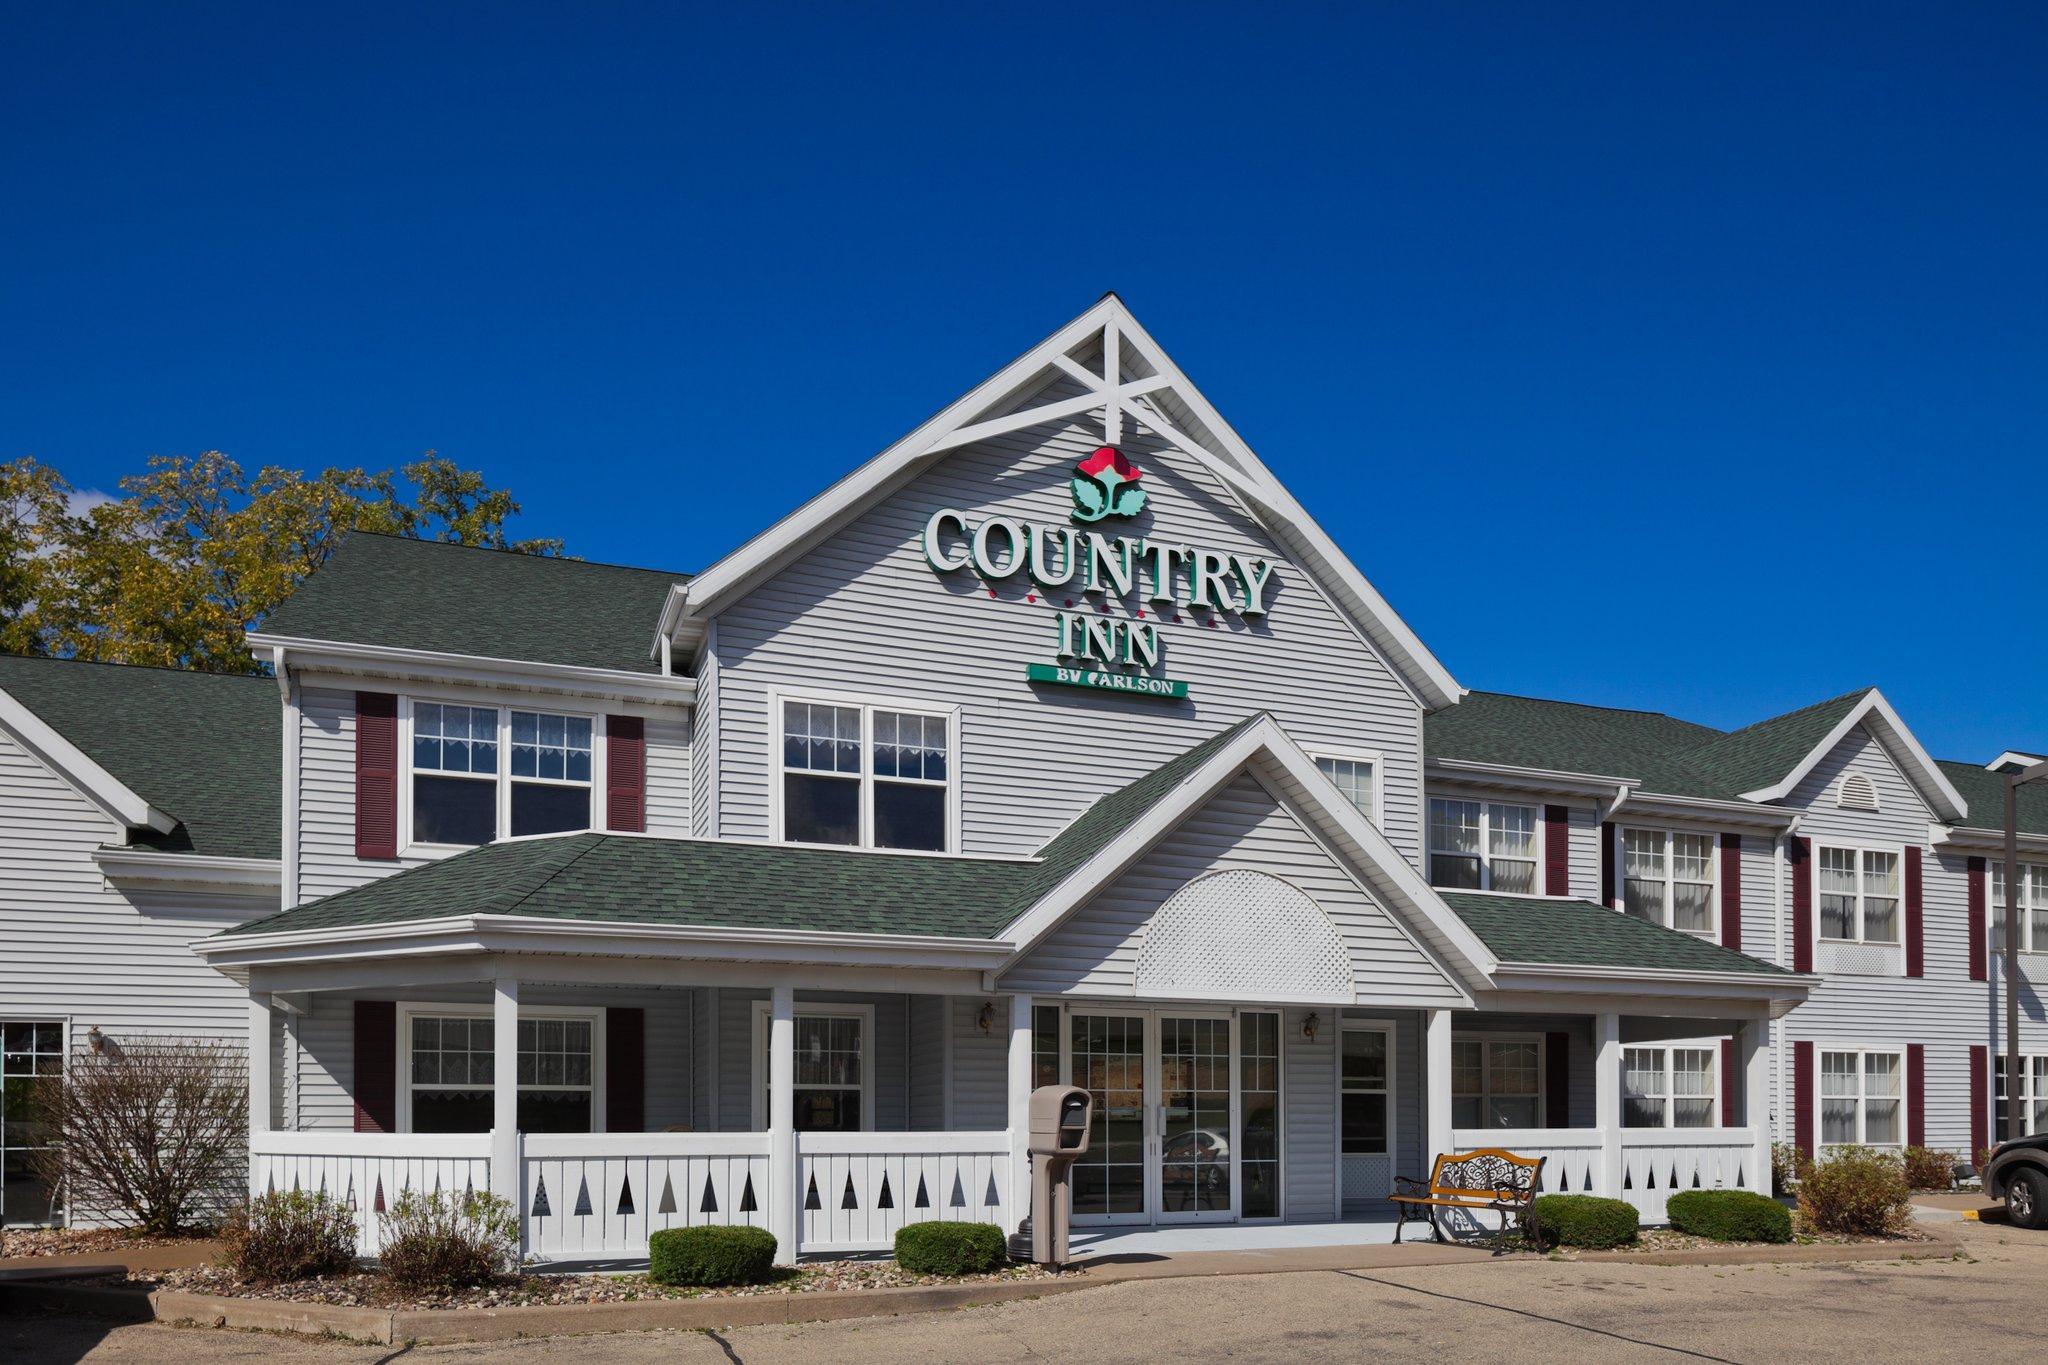 Country Inn By Carlson, Platteville